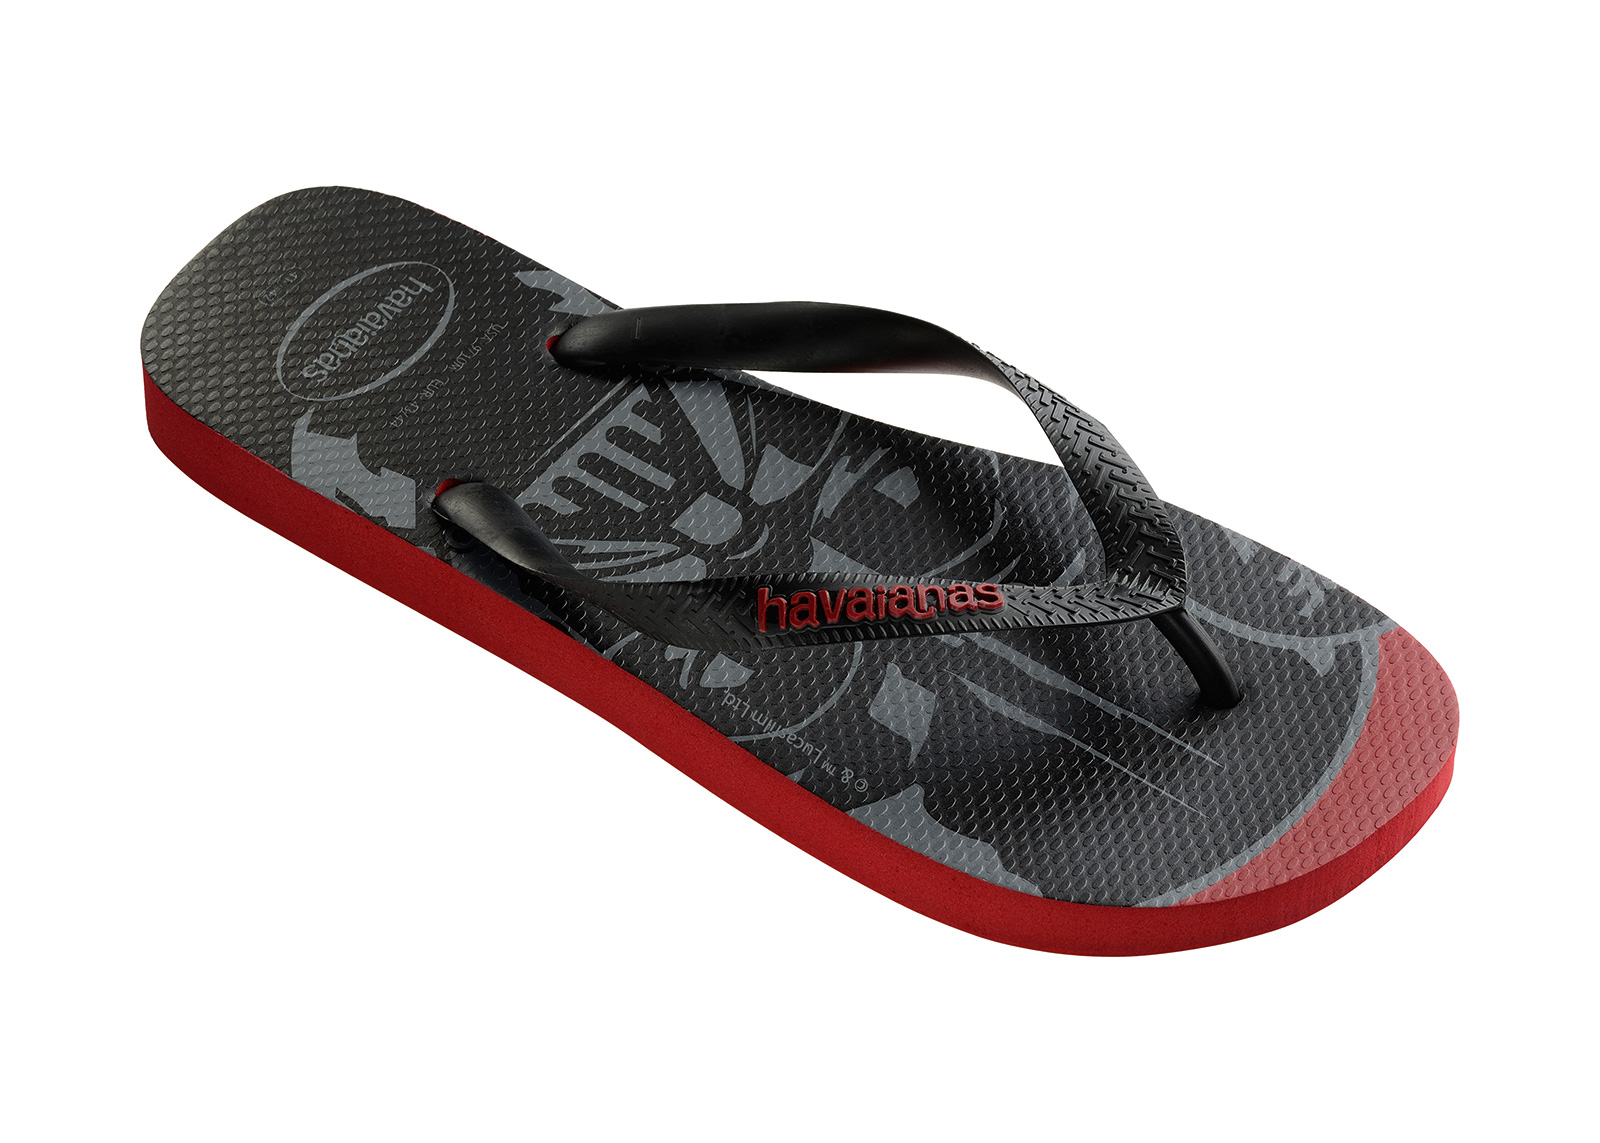 96a97a5f7290 Flip-Flops Flip-flops - Havaianas Star Wars Red - Brand Havaianas